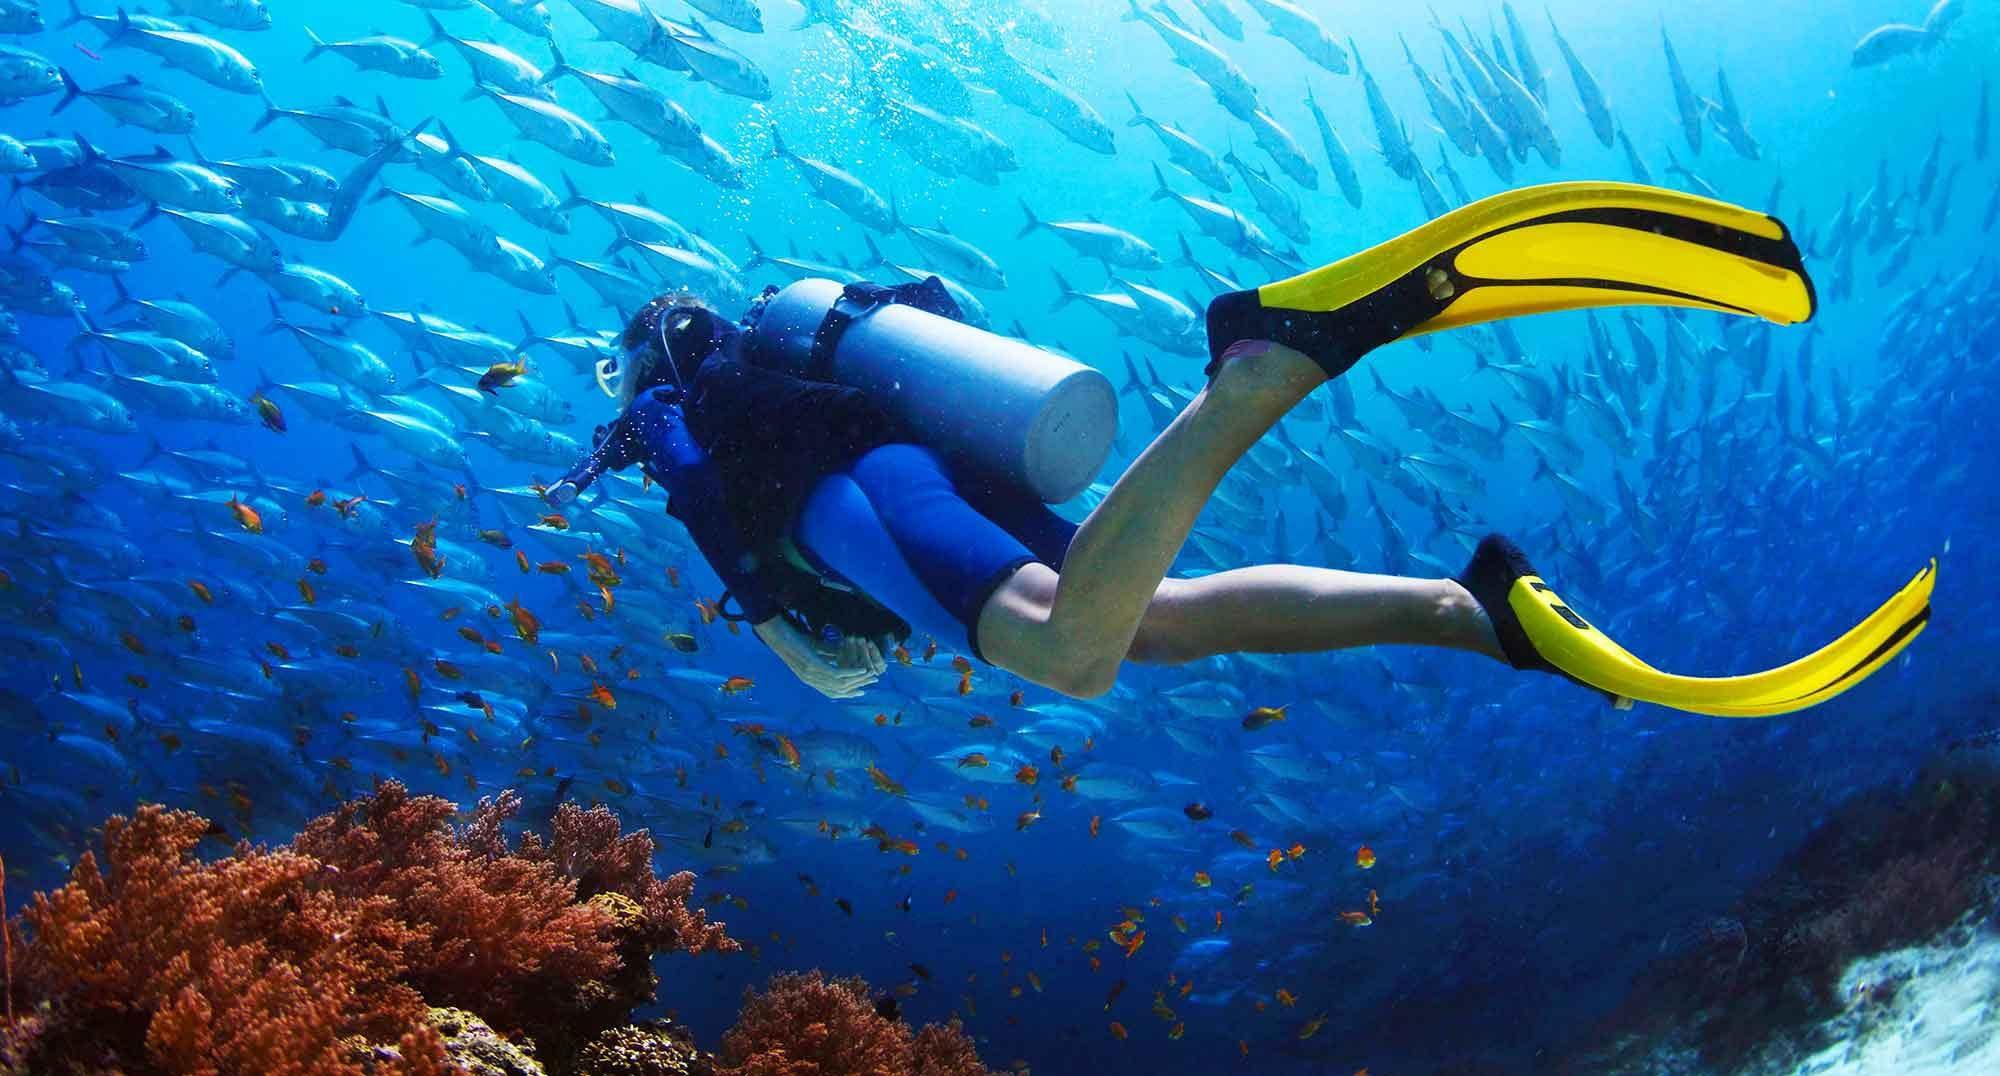 Scuba Diving Risks - Pressure, Depth and Consequences